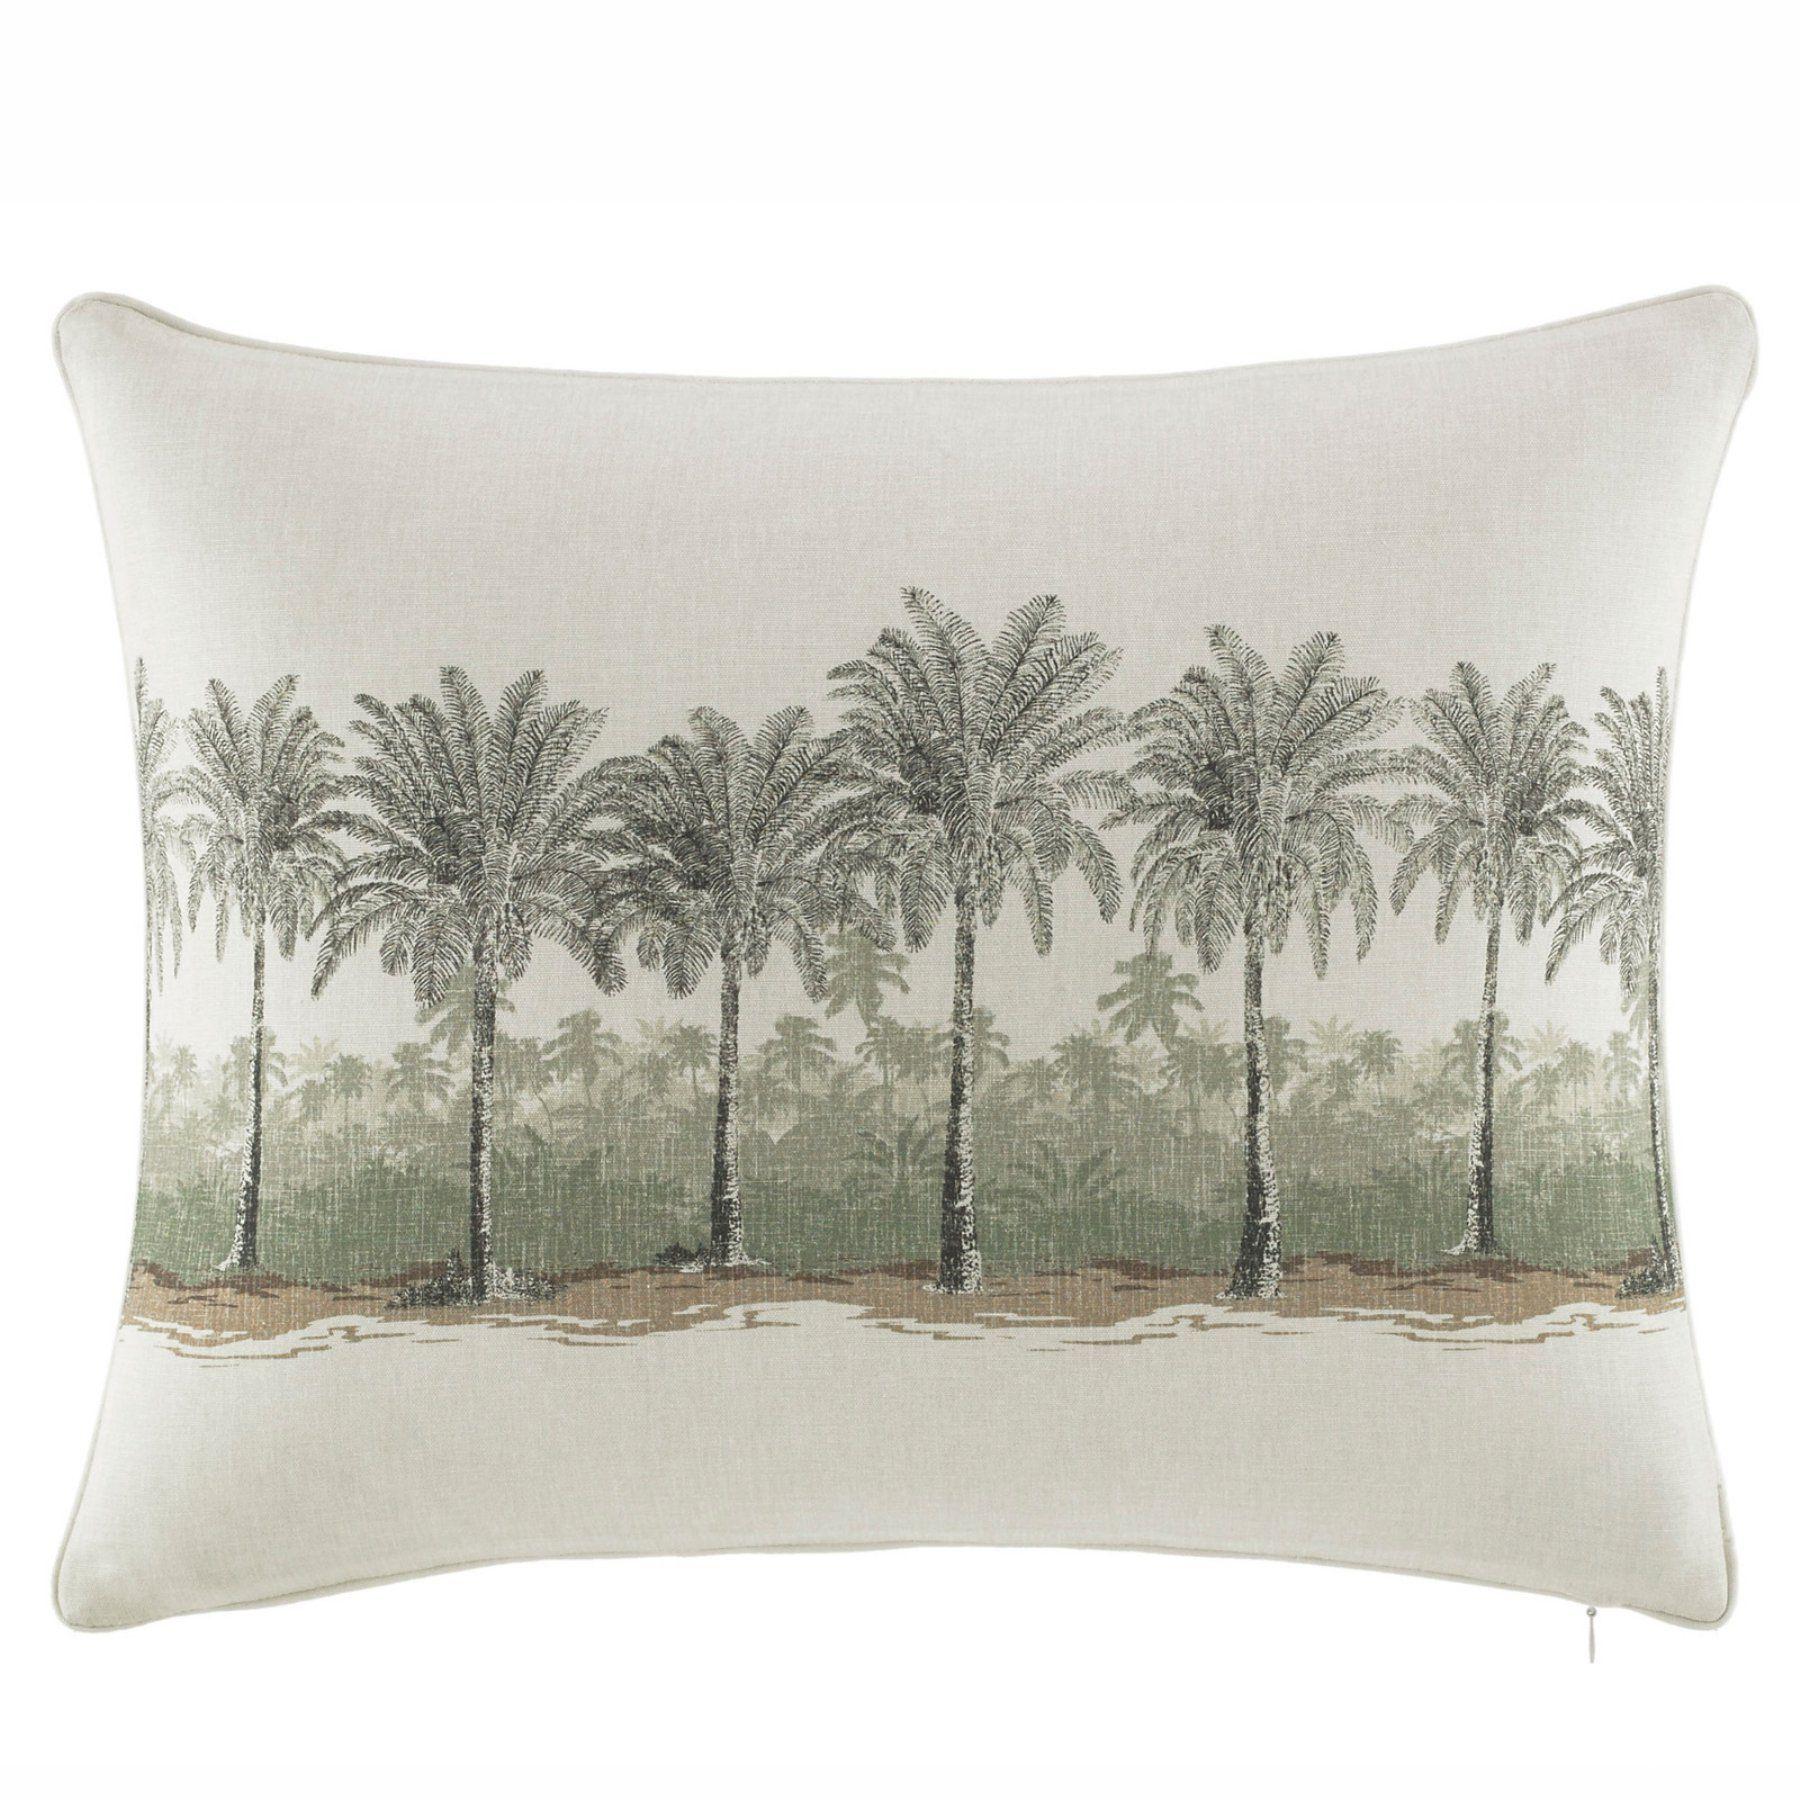 Tommy Bahama Breezer Palm Breakfast Pillow - 220210   Tommy bahama ...